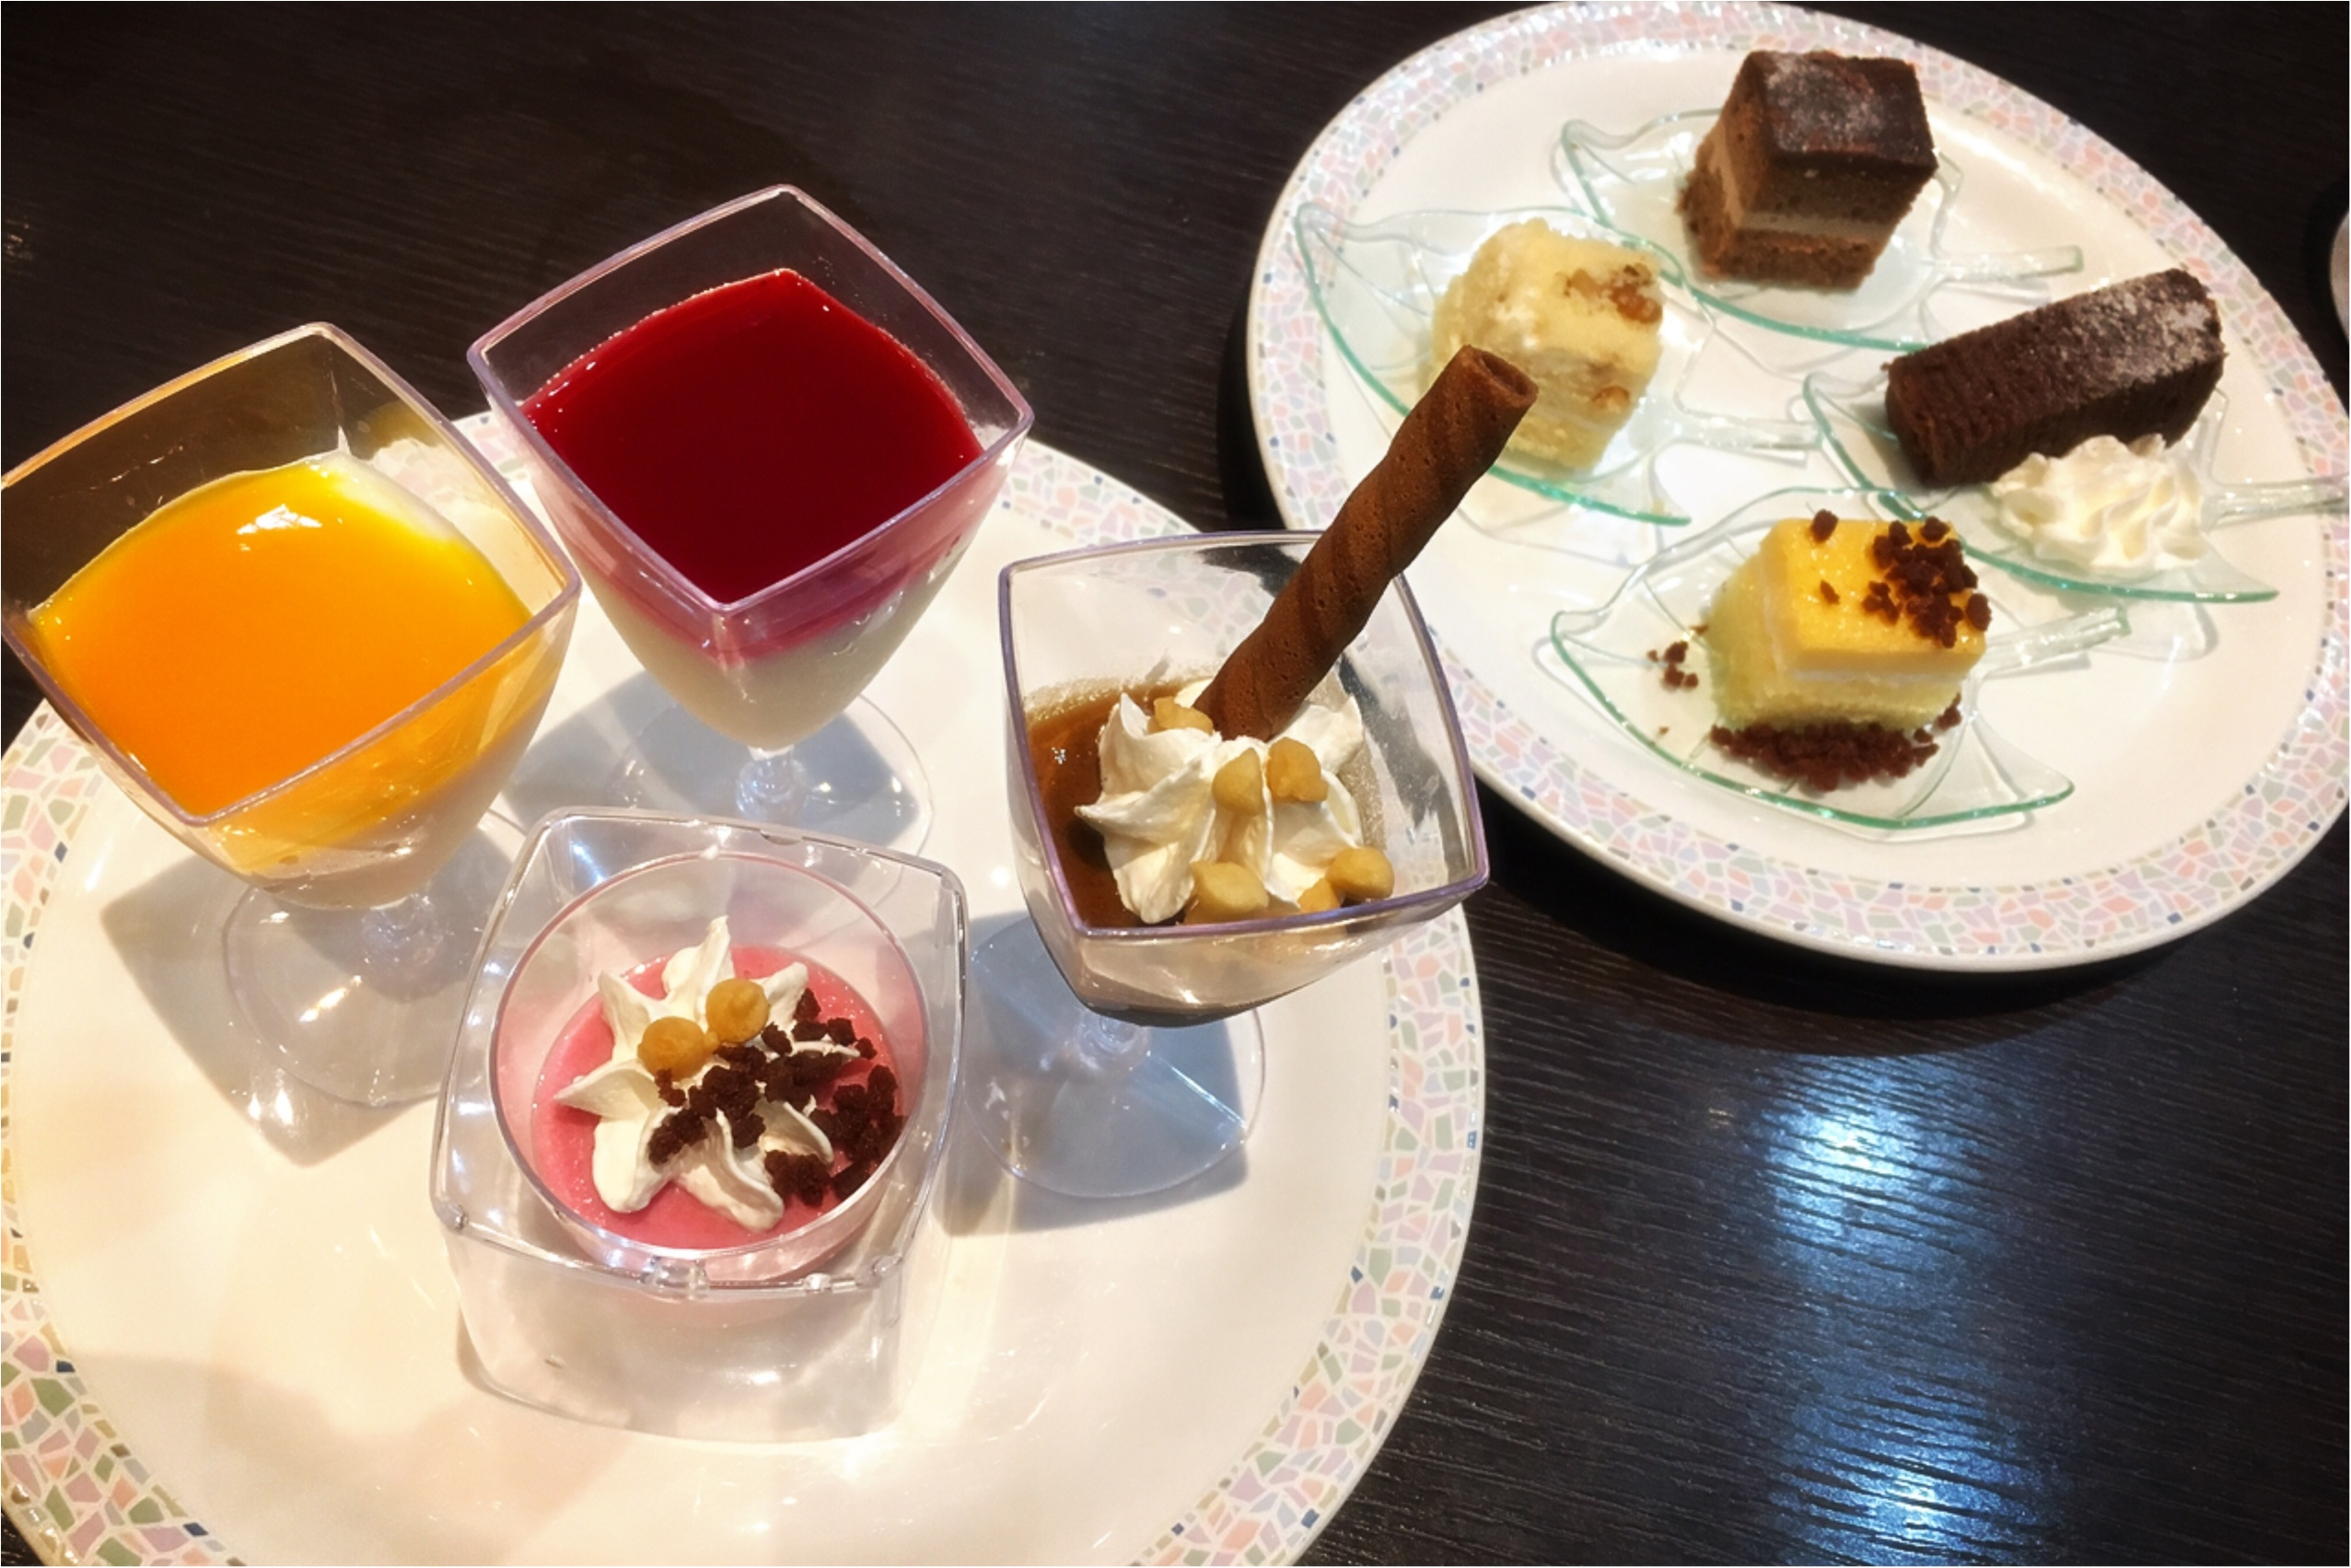 【DINNER】いまお得なディナーはココ!第一ホテル東京シーフォートへ行ってきました☆_8